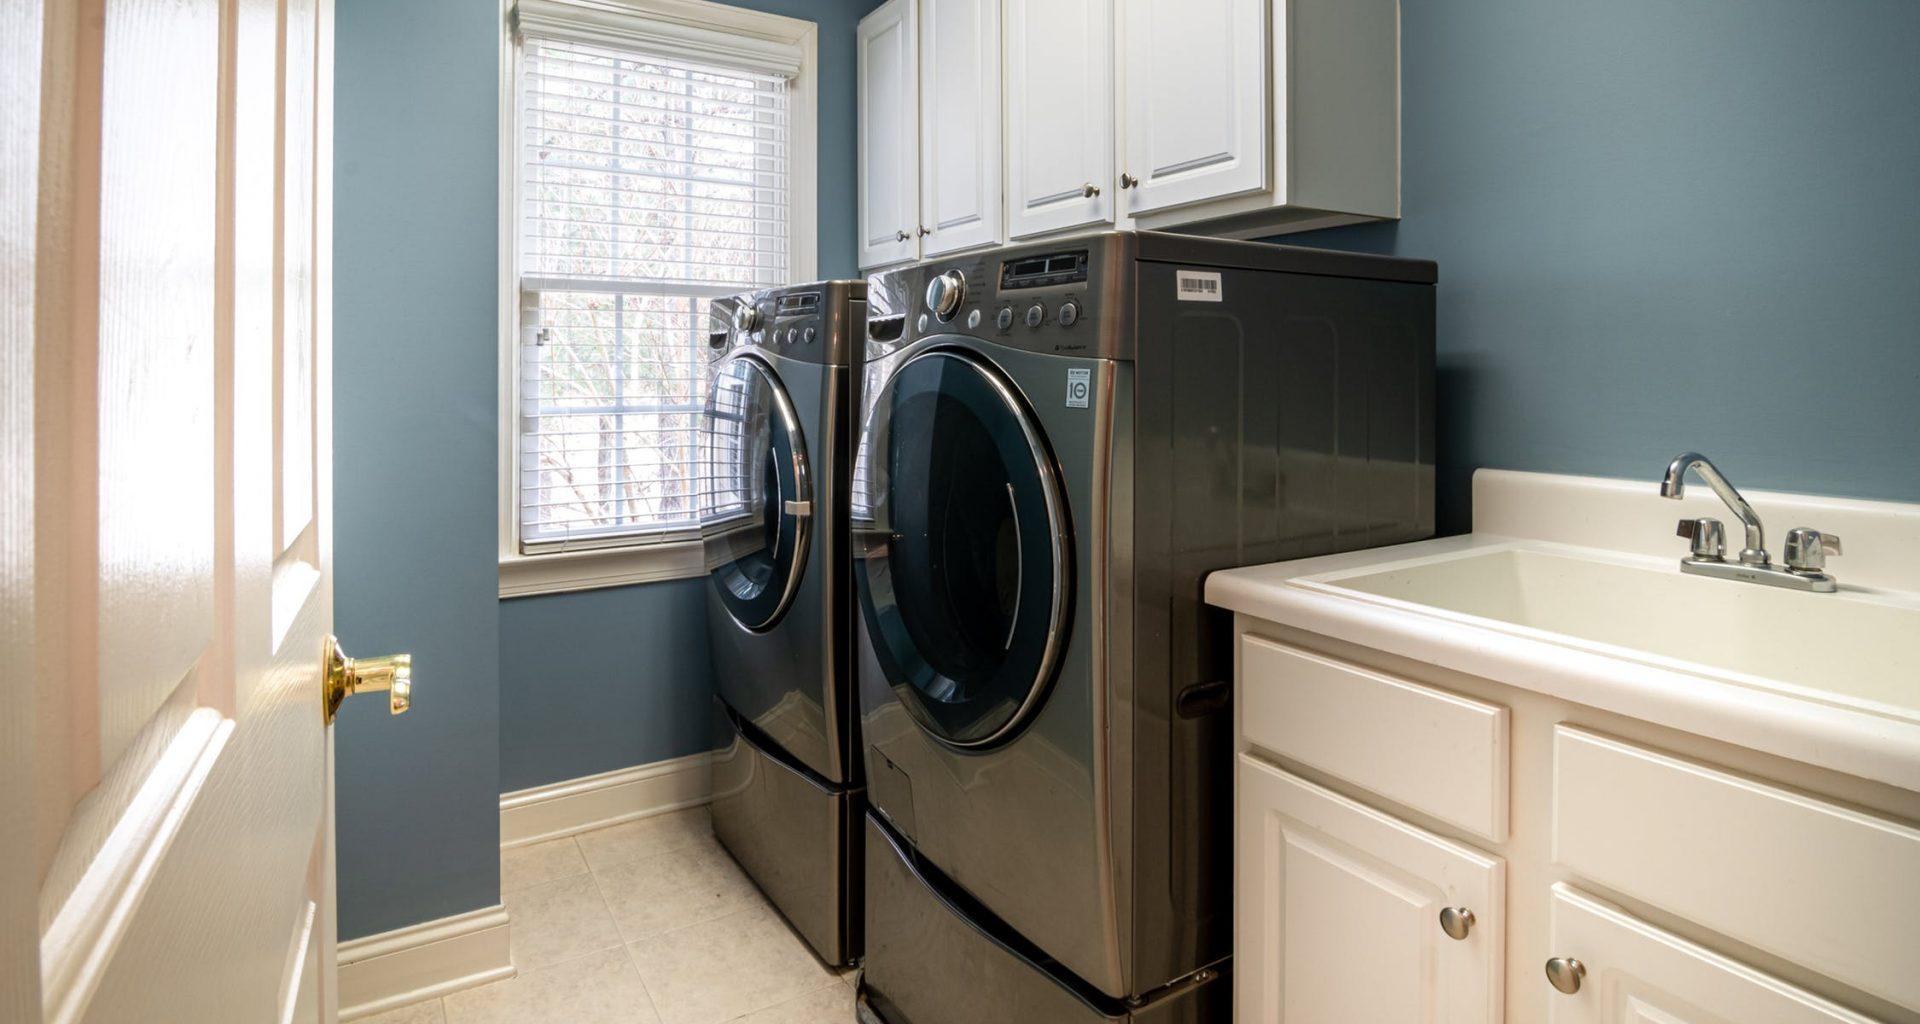 wasmachine: hoe lang gaat ie mee?